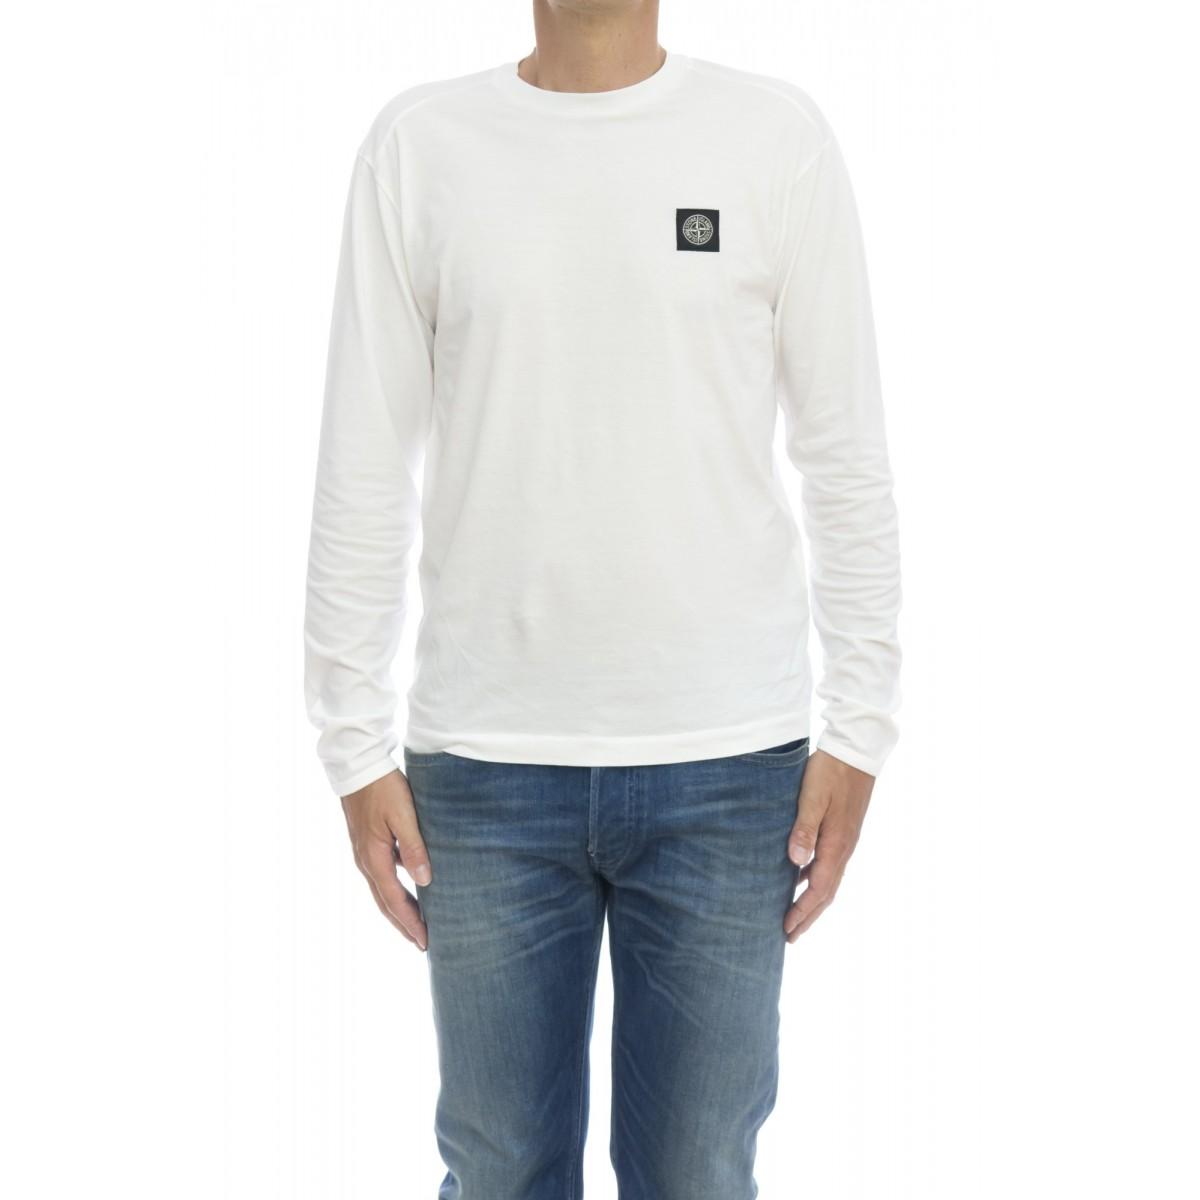 T-shirt - 24041 t-shirt manica lunga patch